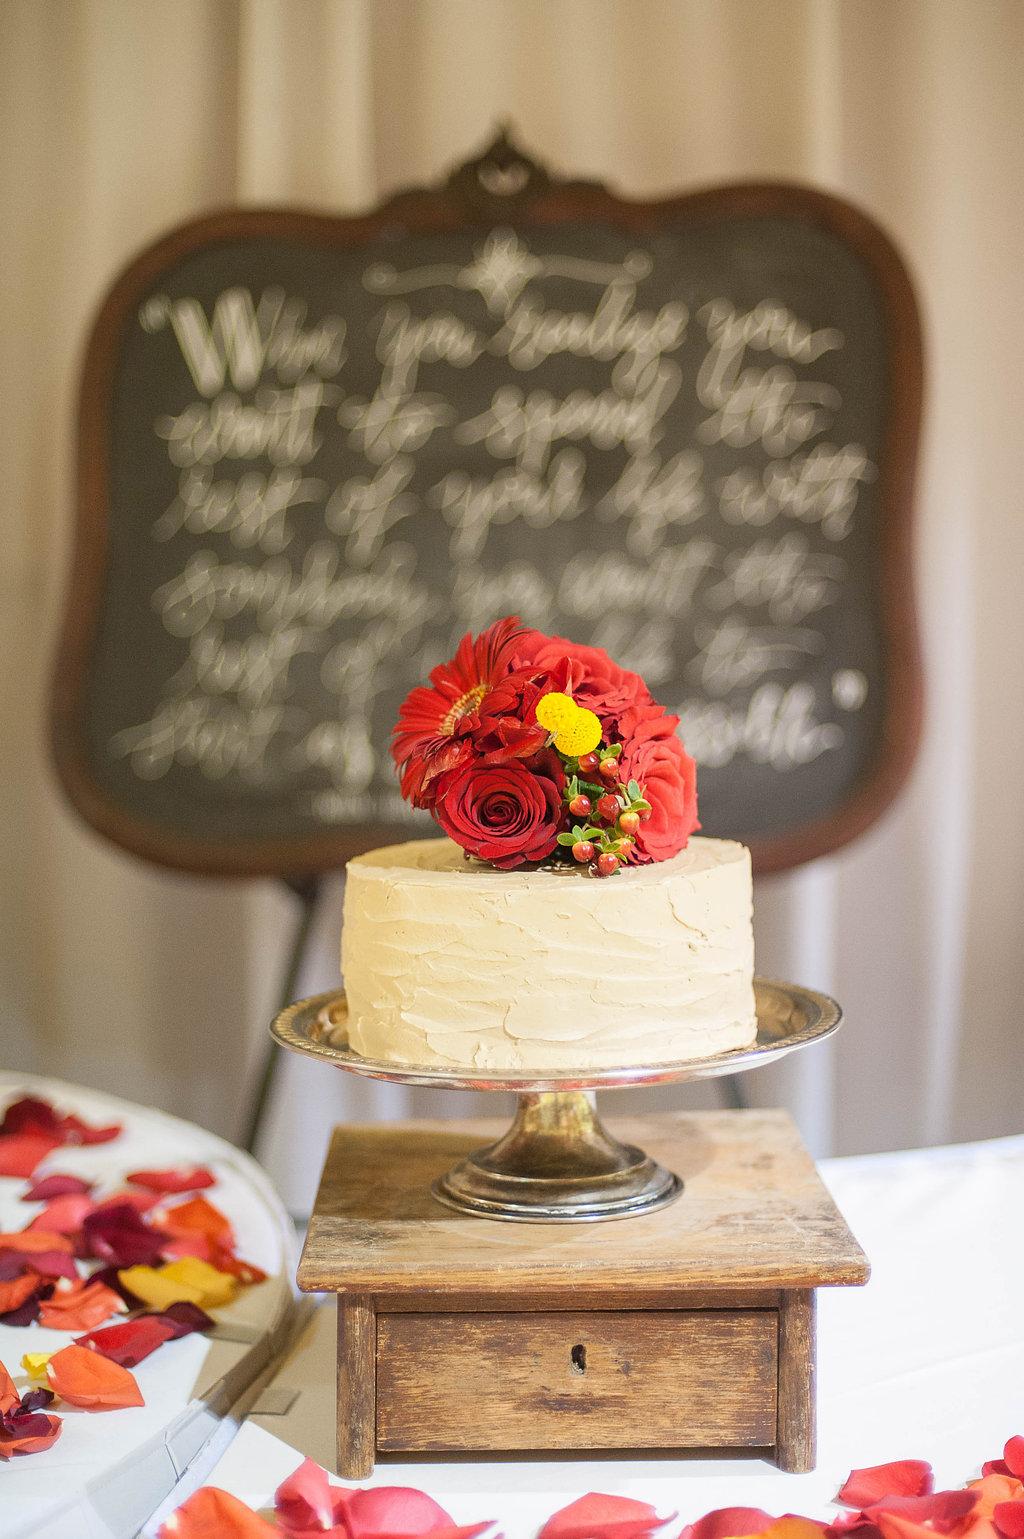 Pomeranke_Cake-0449